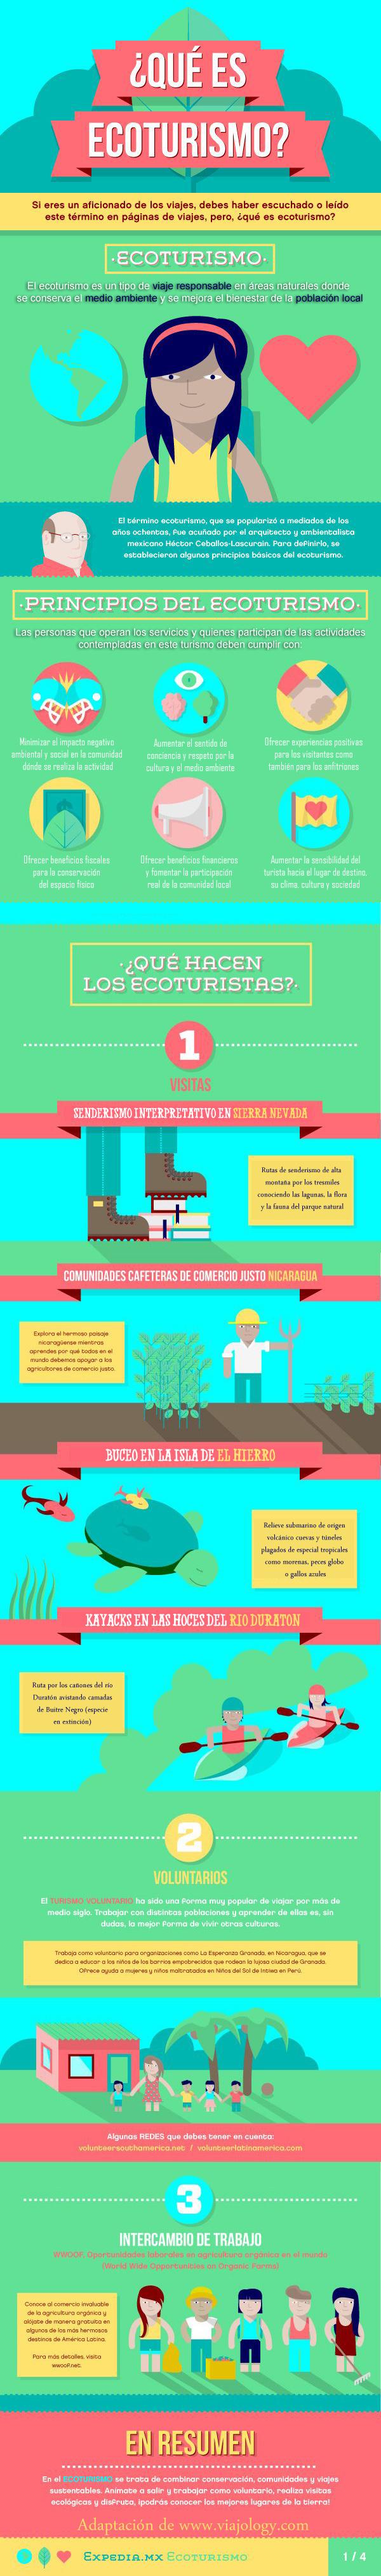 Infografia Ecoturismo